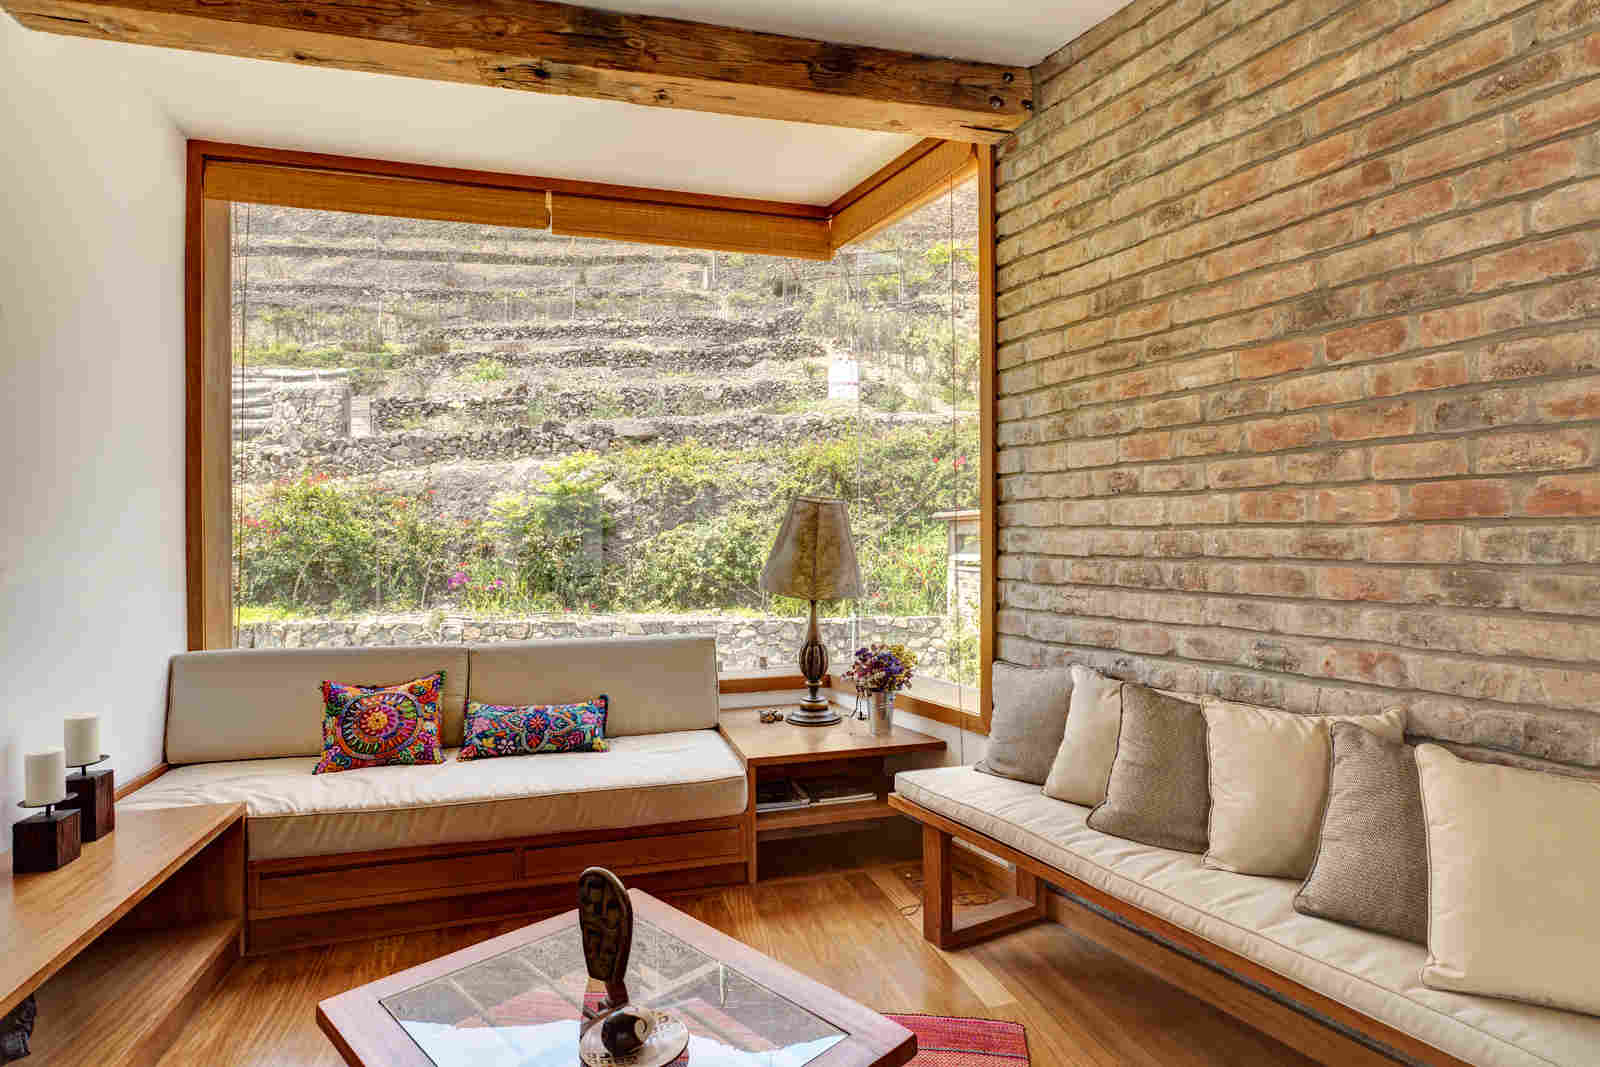 wood furniture design ideas, living room